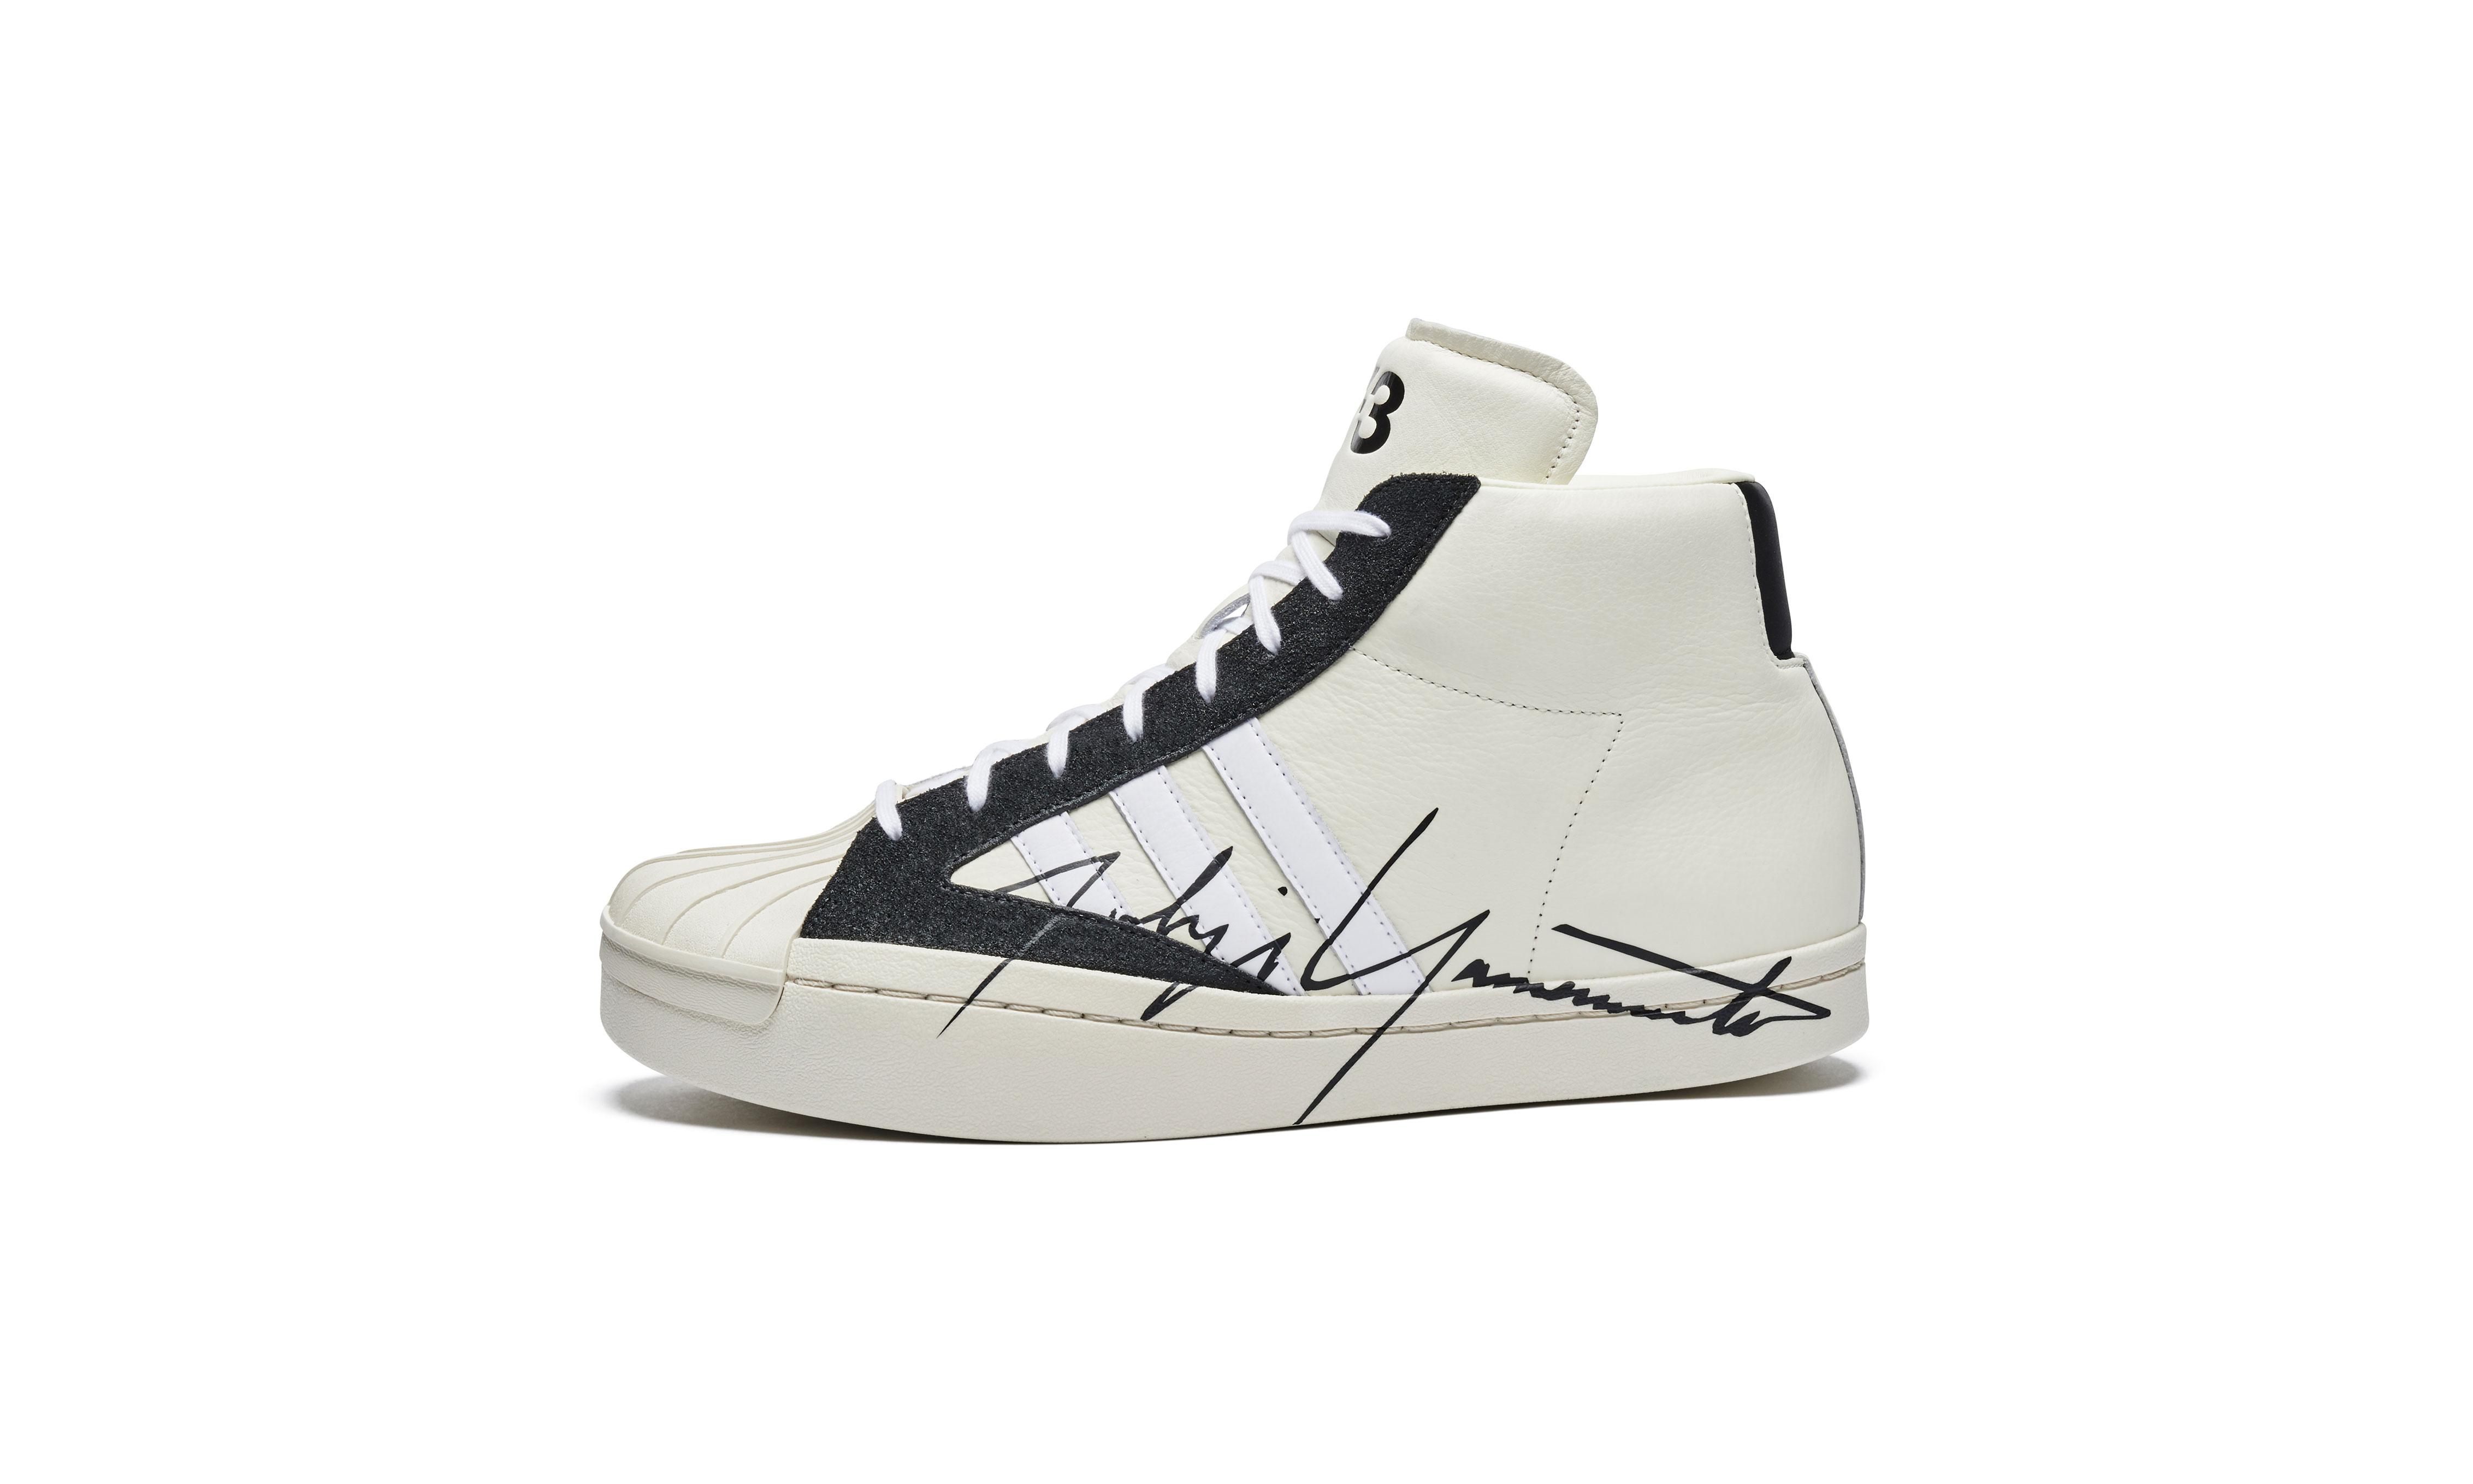 Y-3 重塑 adidas Superstar,推出两双全新鞋款